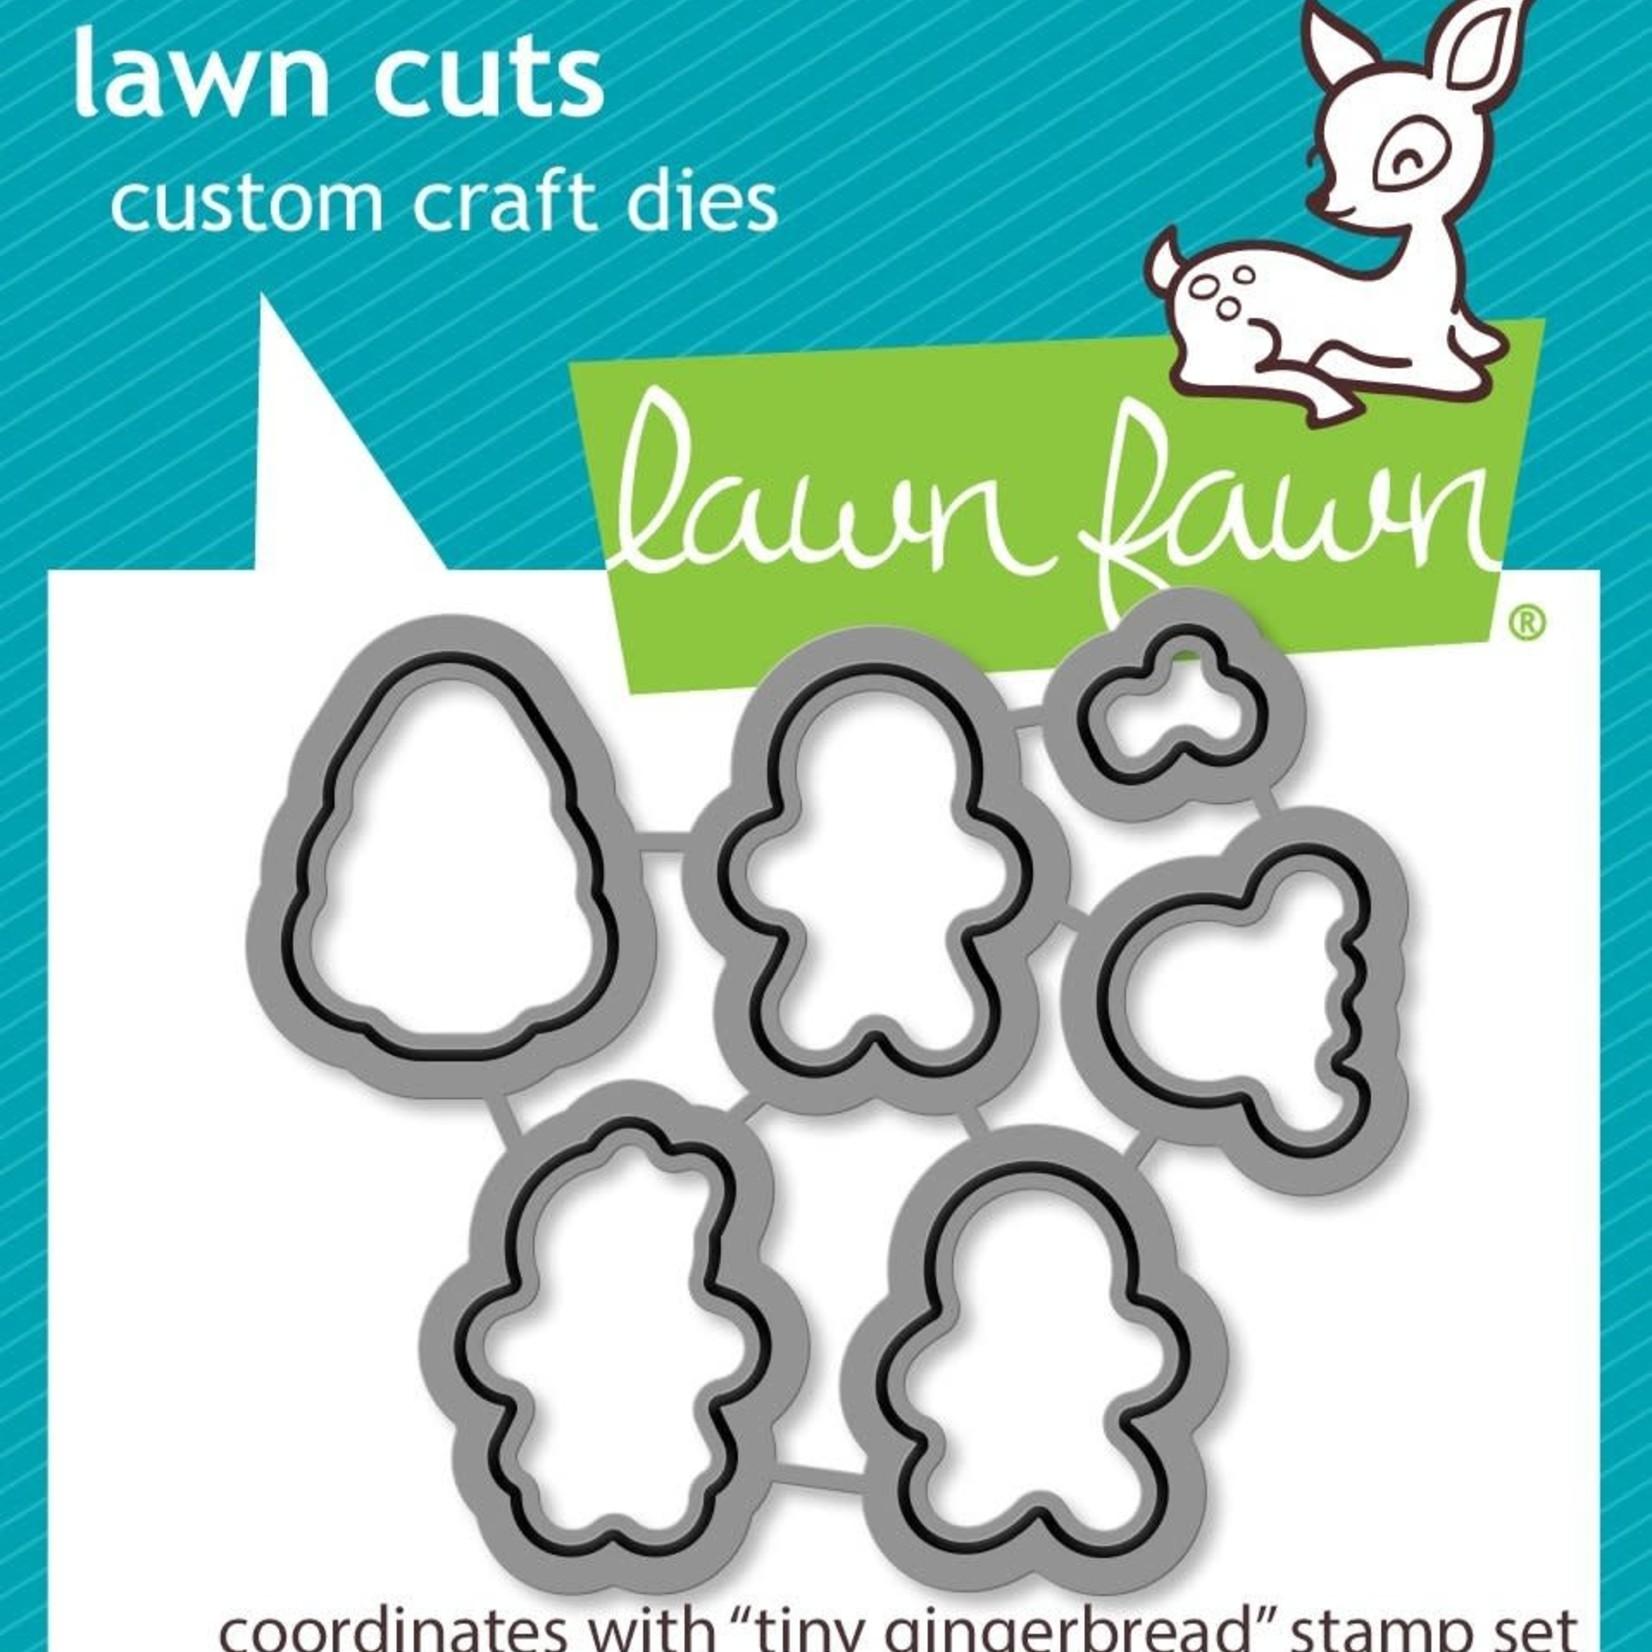 Lawn Fawn Lawn Cuts Custom Craft Die -Tiny Gingerbread